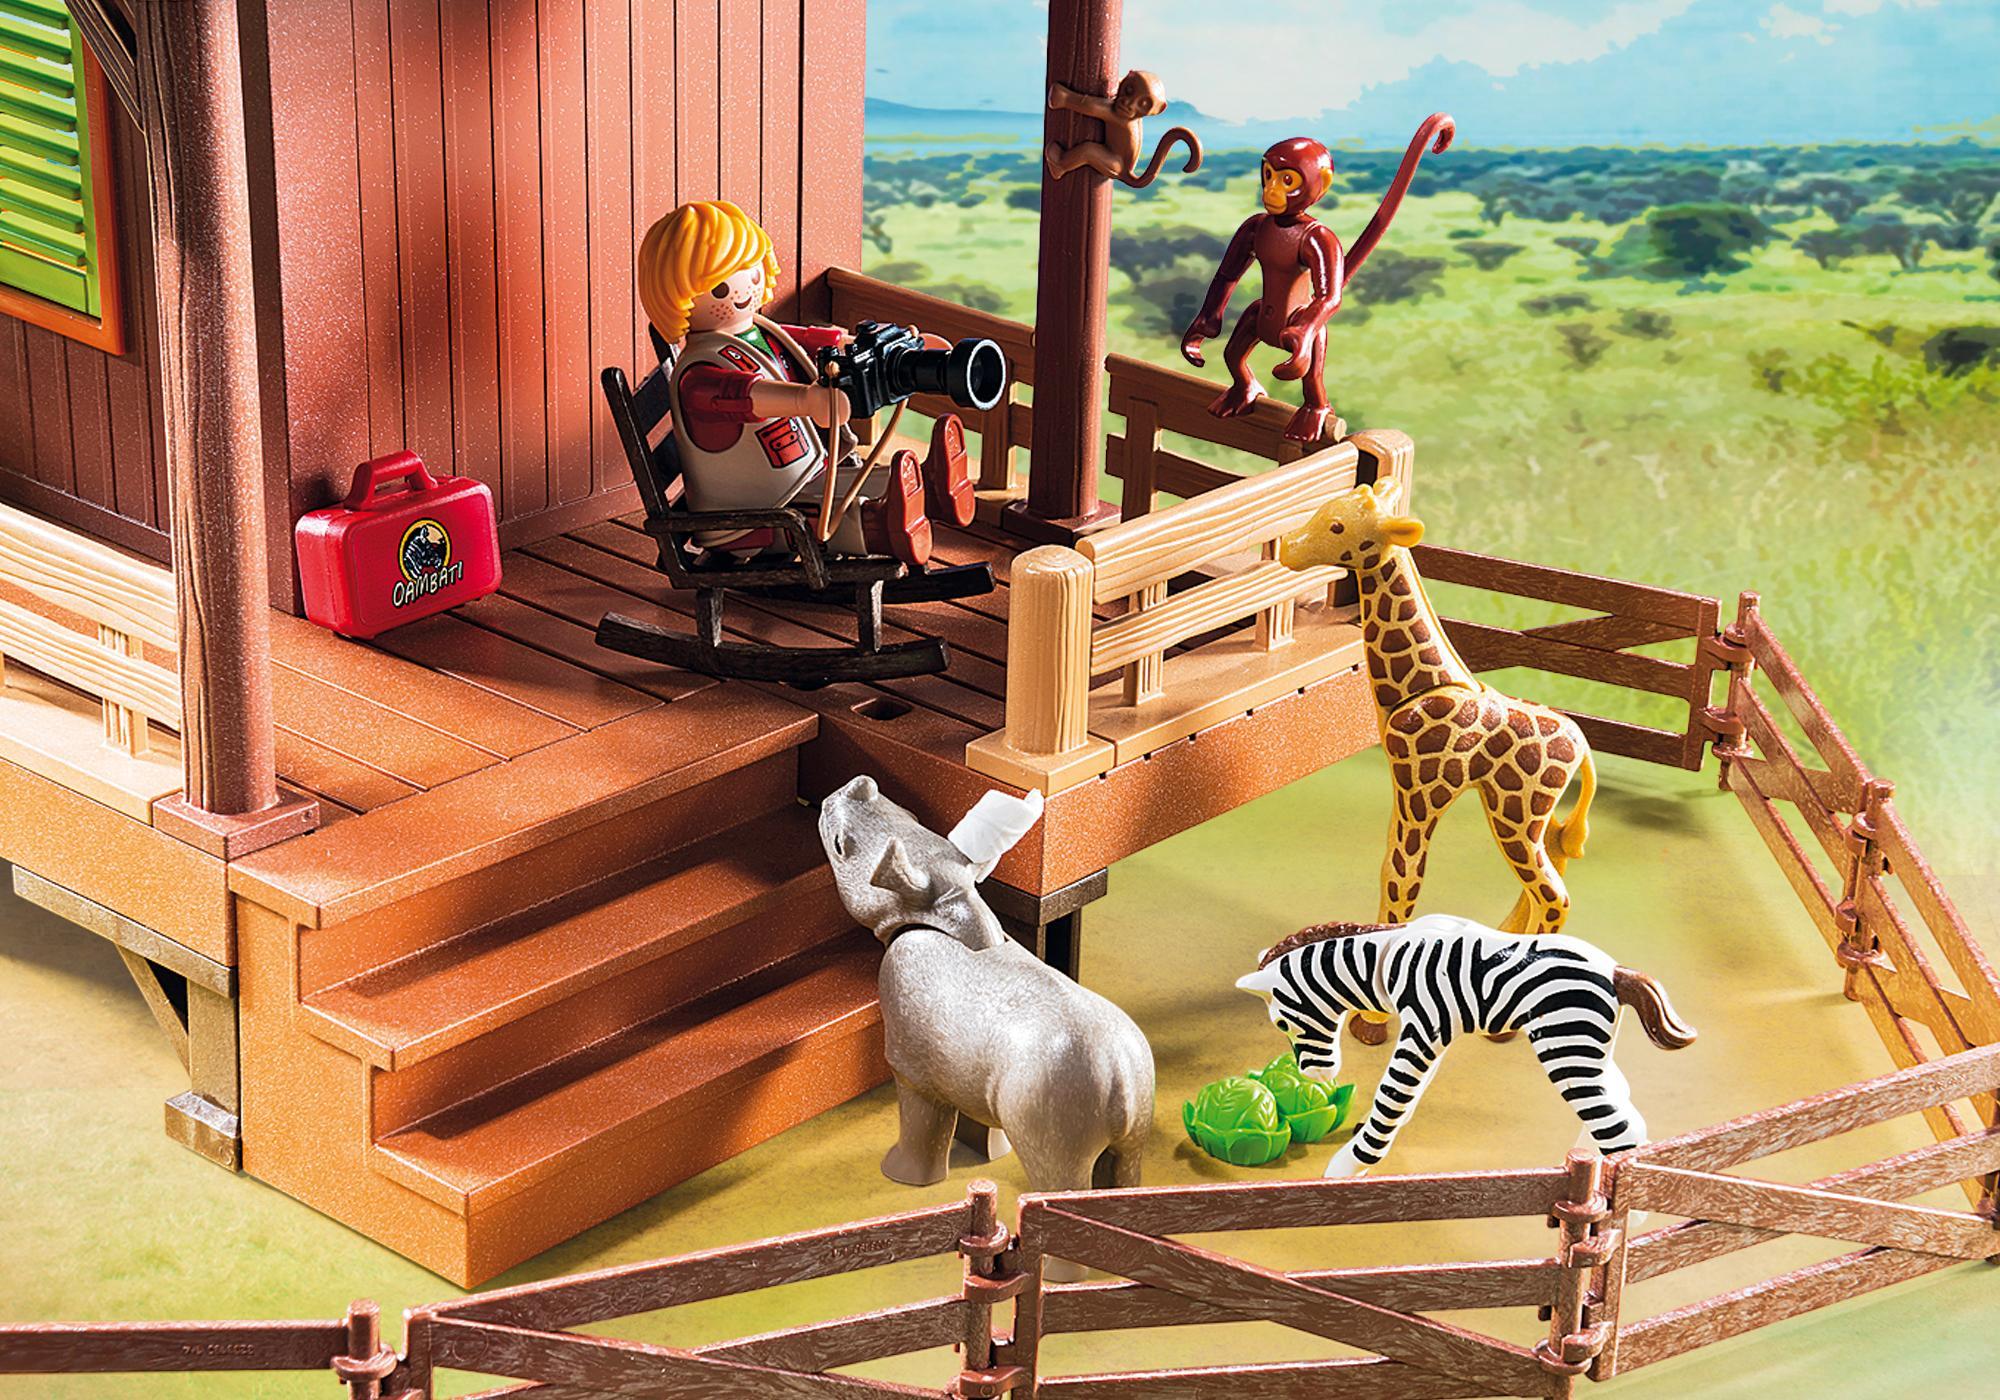 http://media.playmobil.com/i/playmobil/6936_product_extra3/Rangerstation mit Tieraufzucht